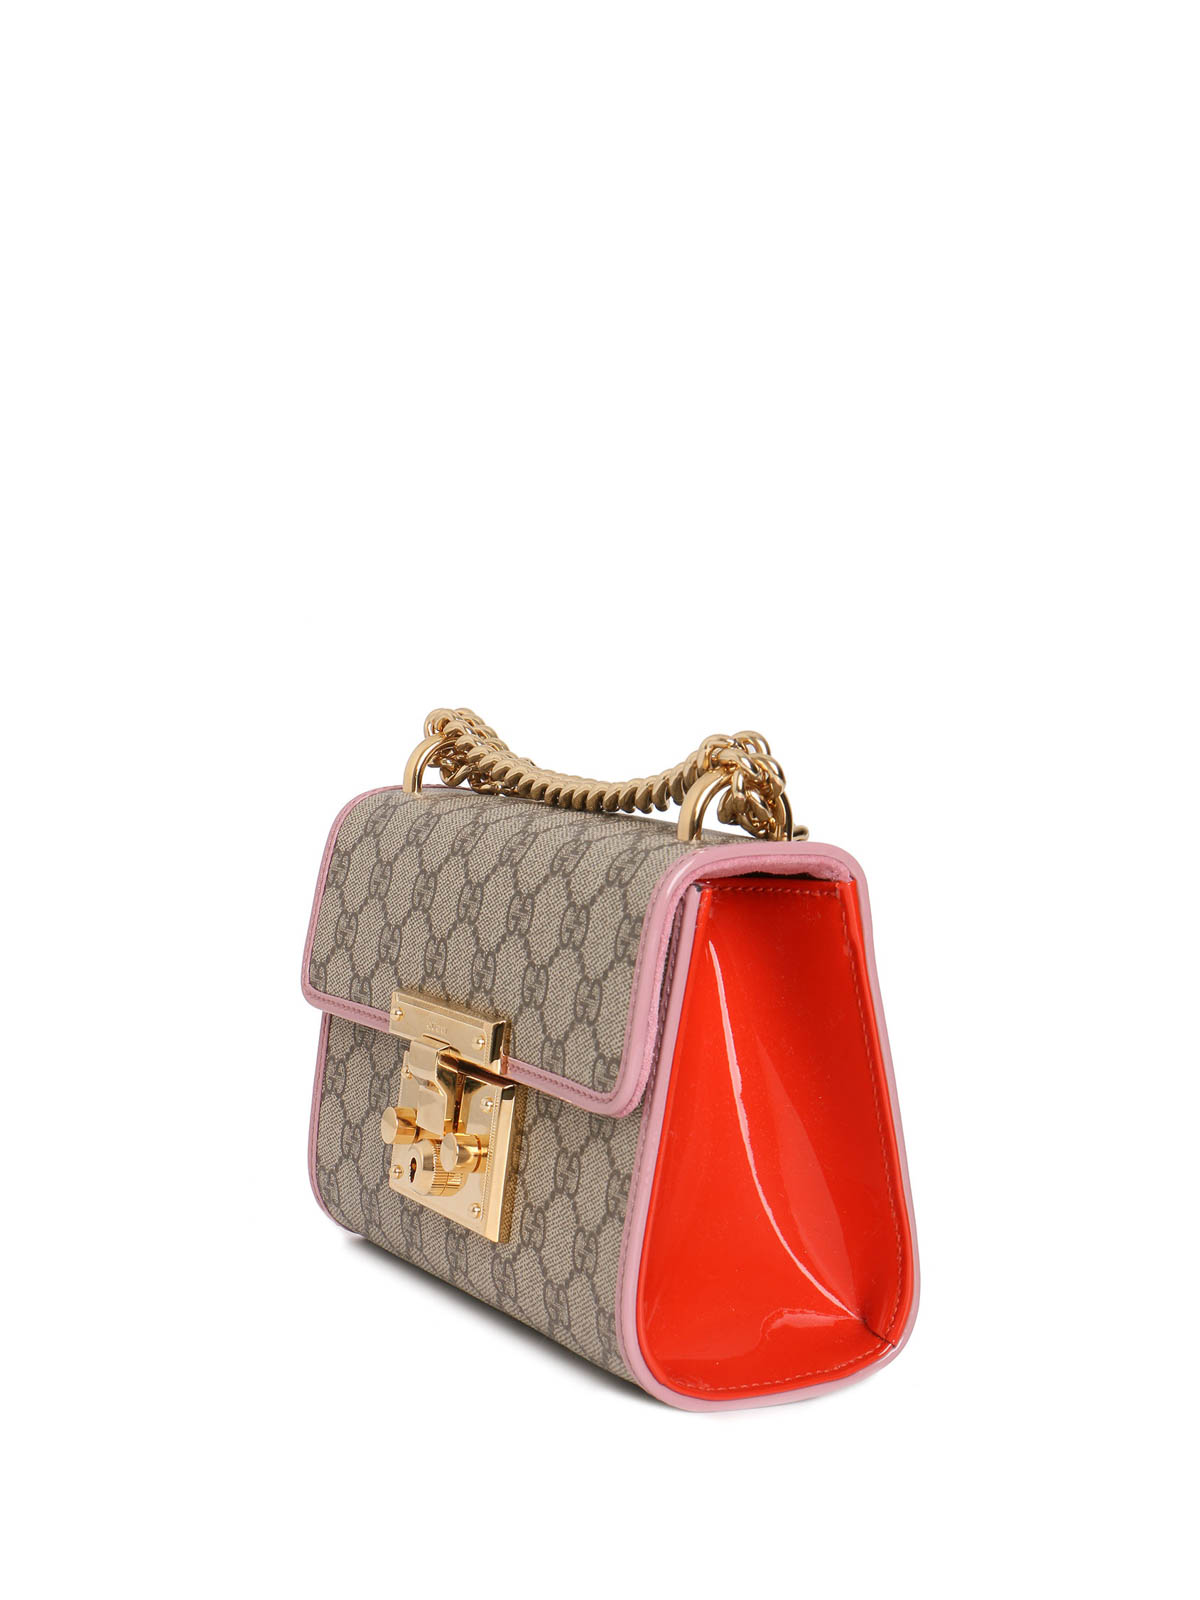 b68d2a9b Gucci - Padlock GG supreme shoulder bag - cross body bags - 409487 ...